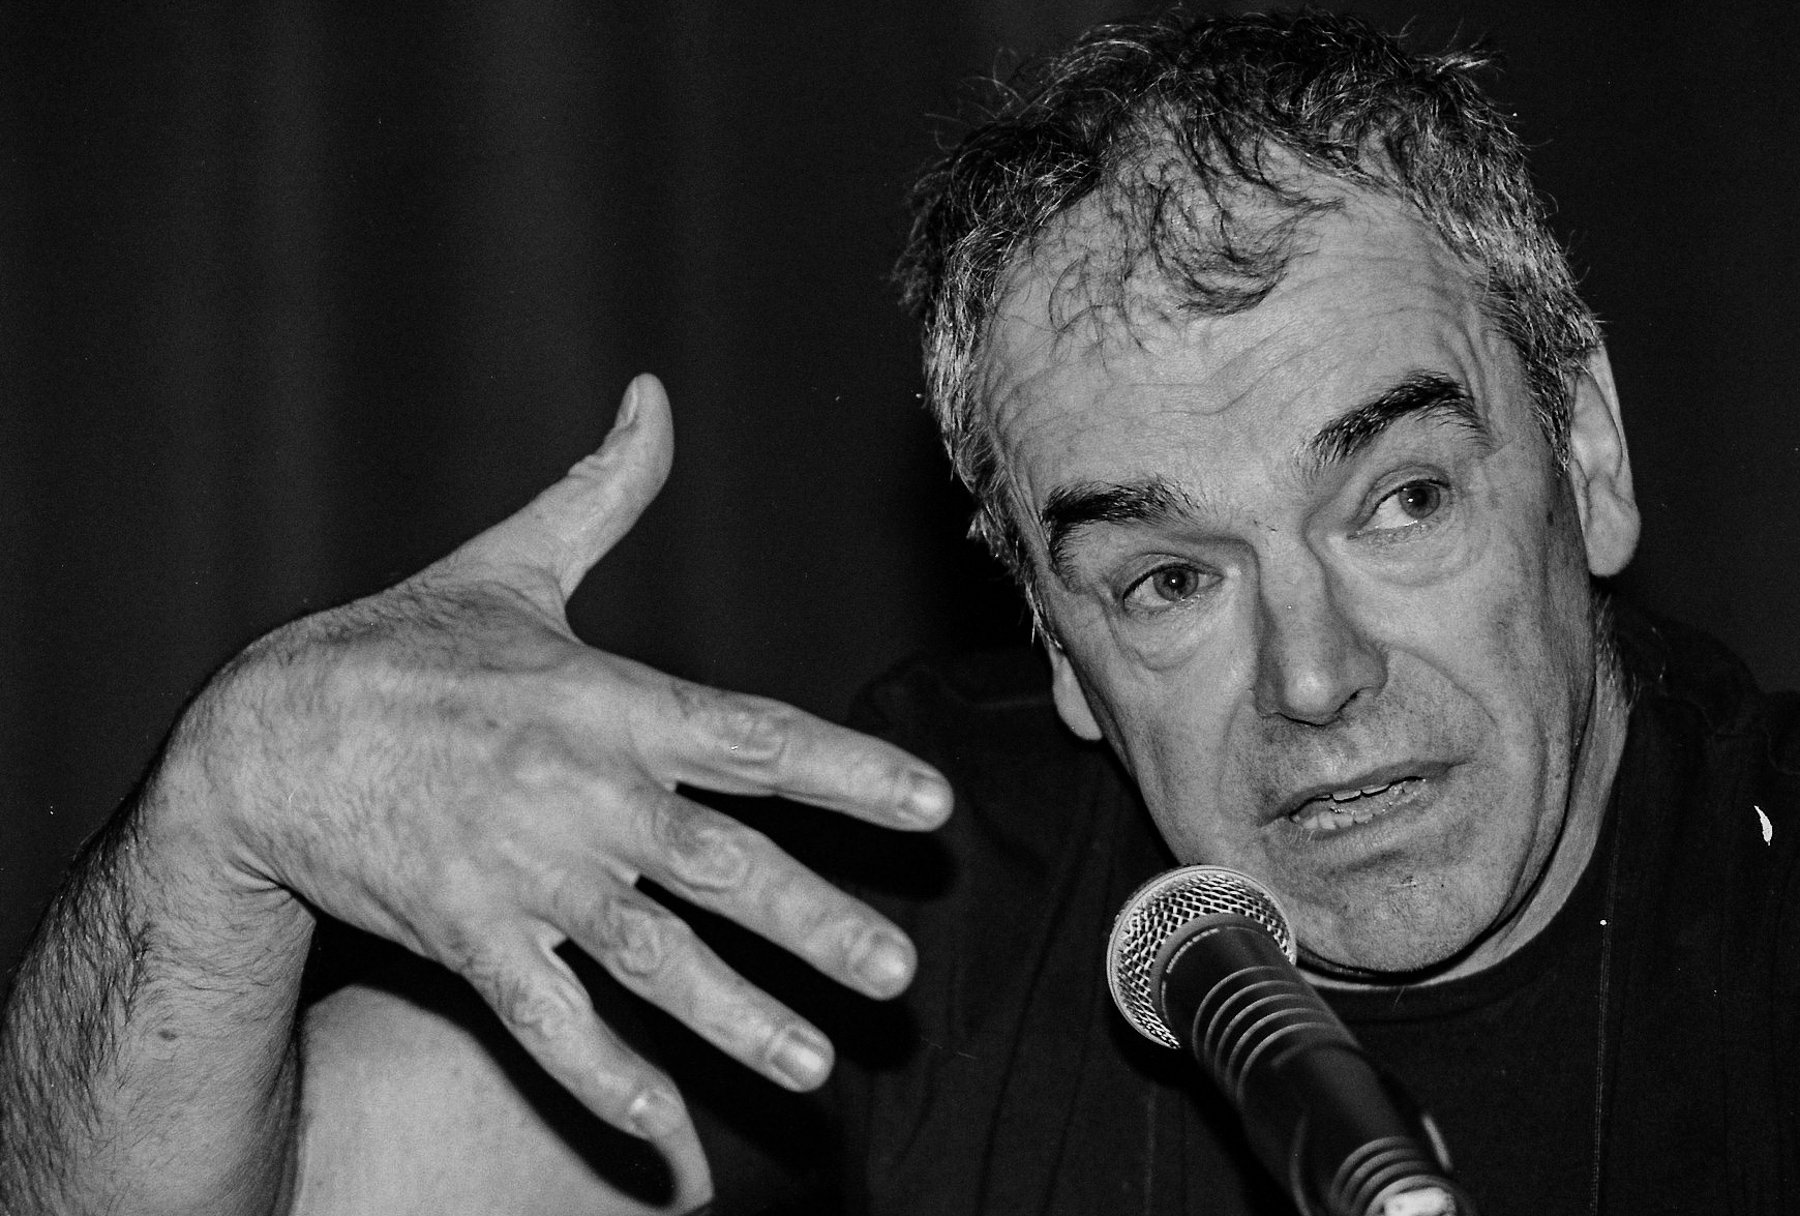 Slawomir Idziak Marburger Kamerapreis